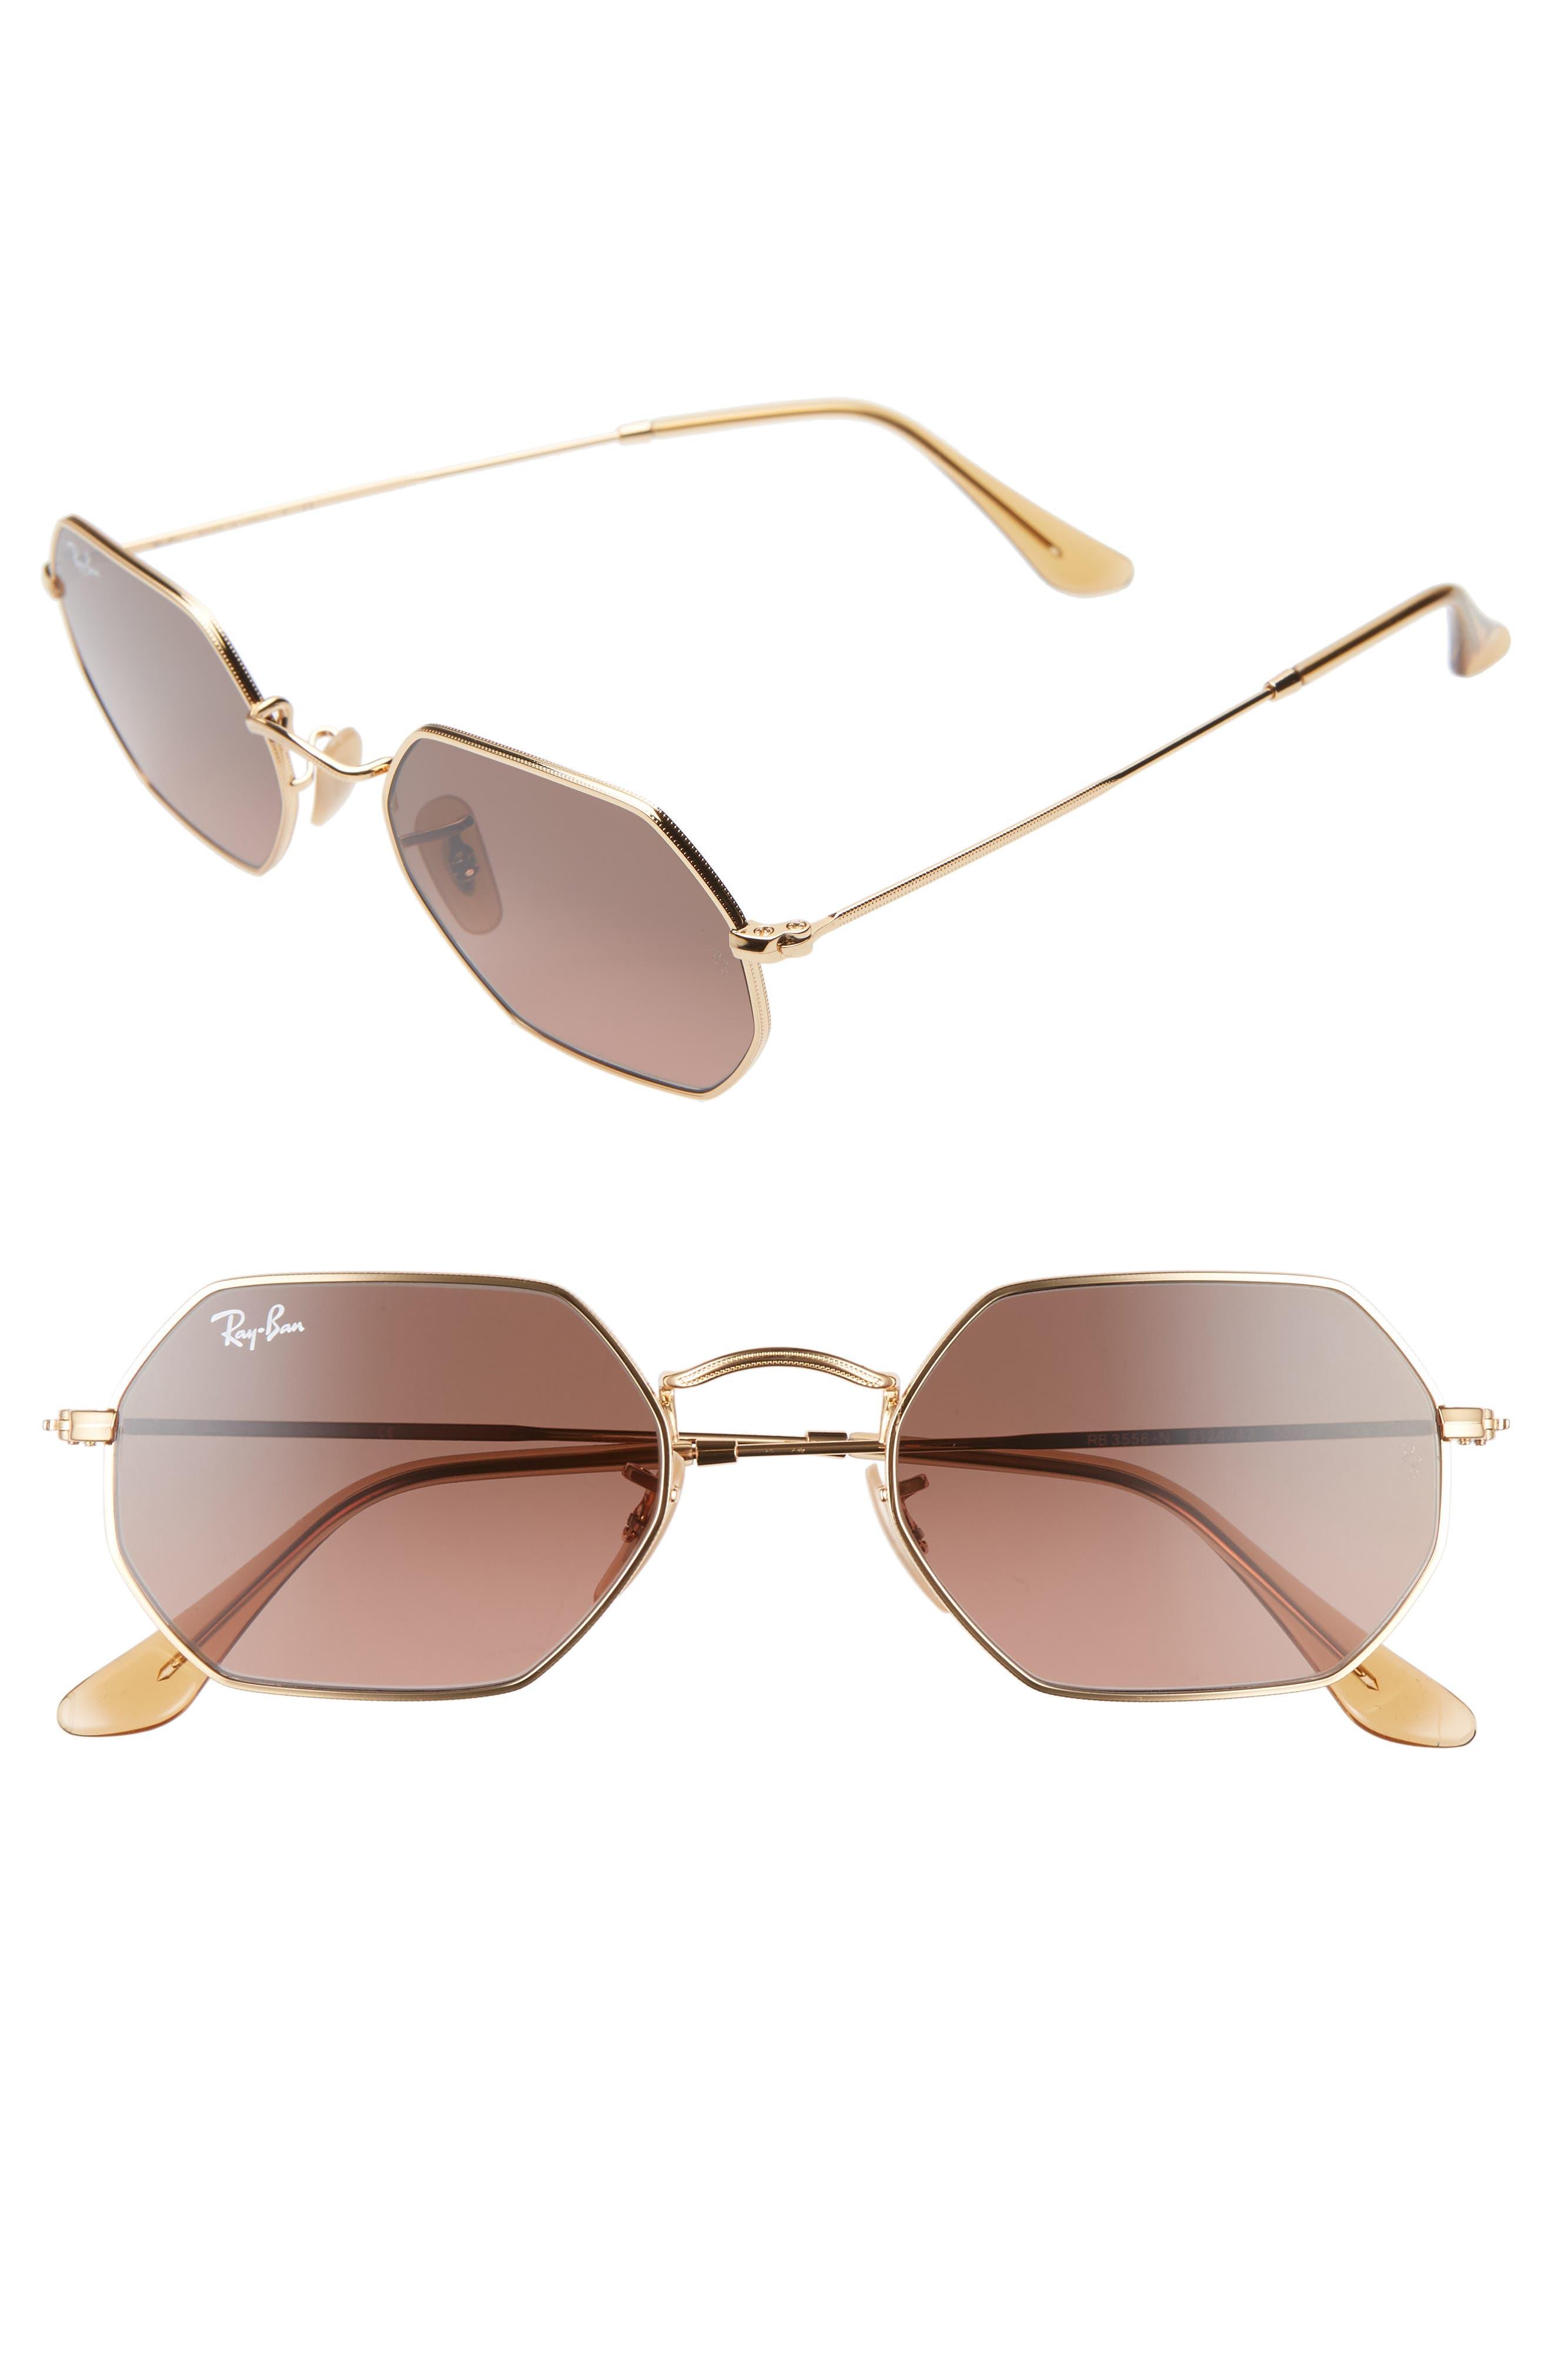 Ray-Ban 5m Rectangular Sunglasses - Gold/ Brown Gradient